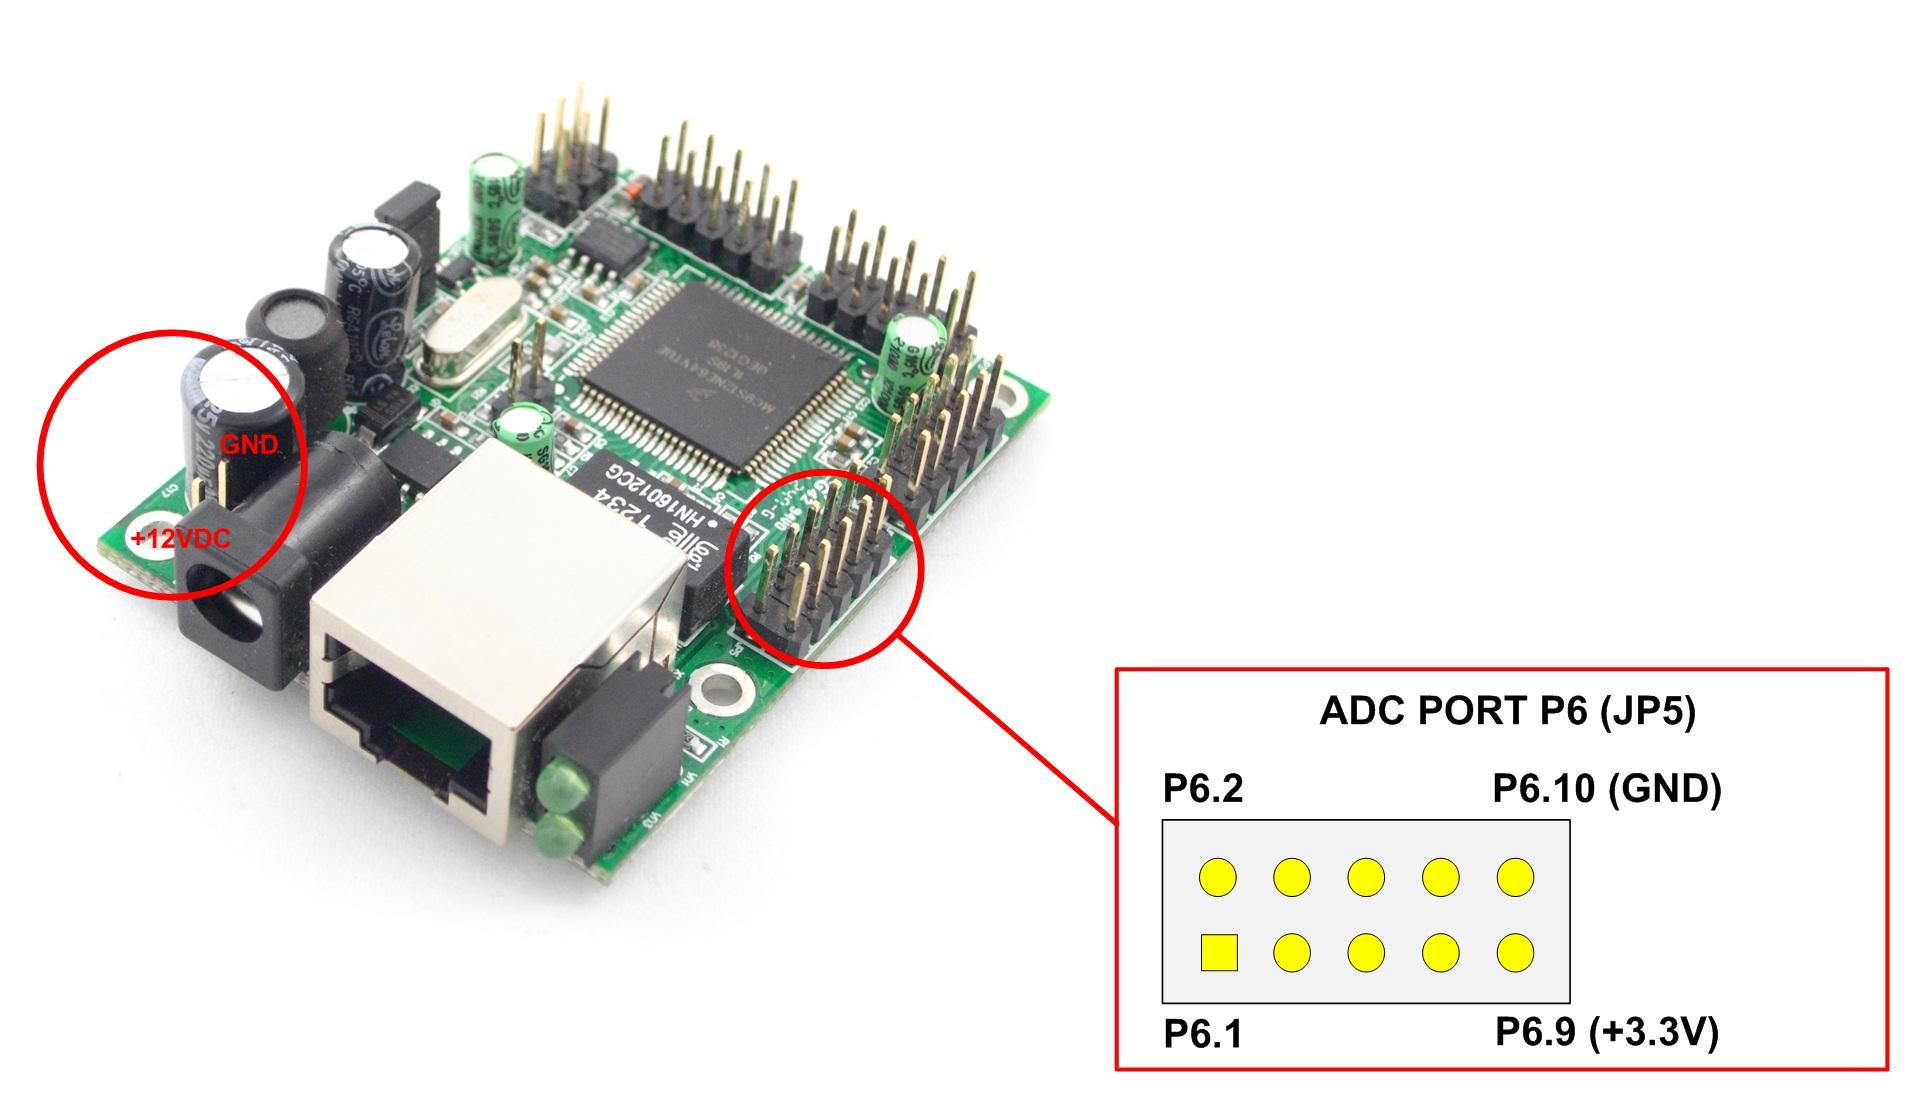 DAEnetIP2 ADC port